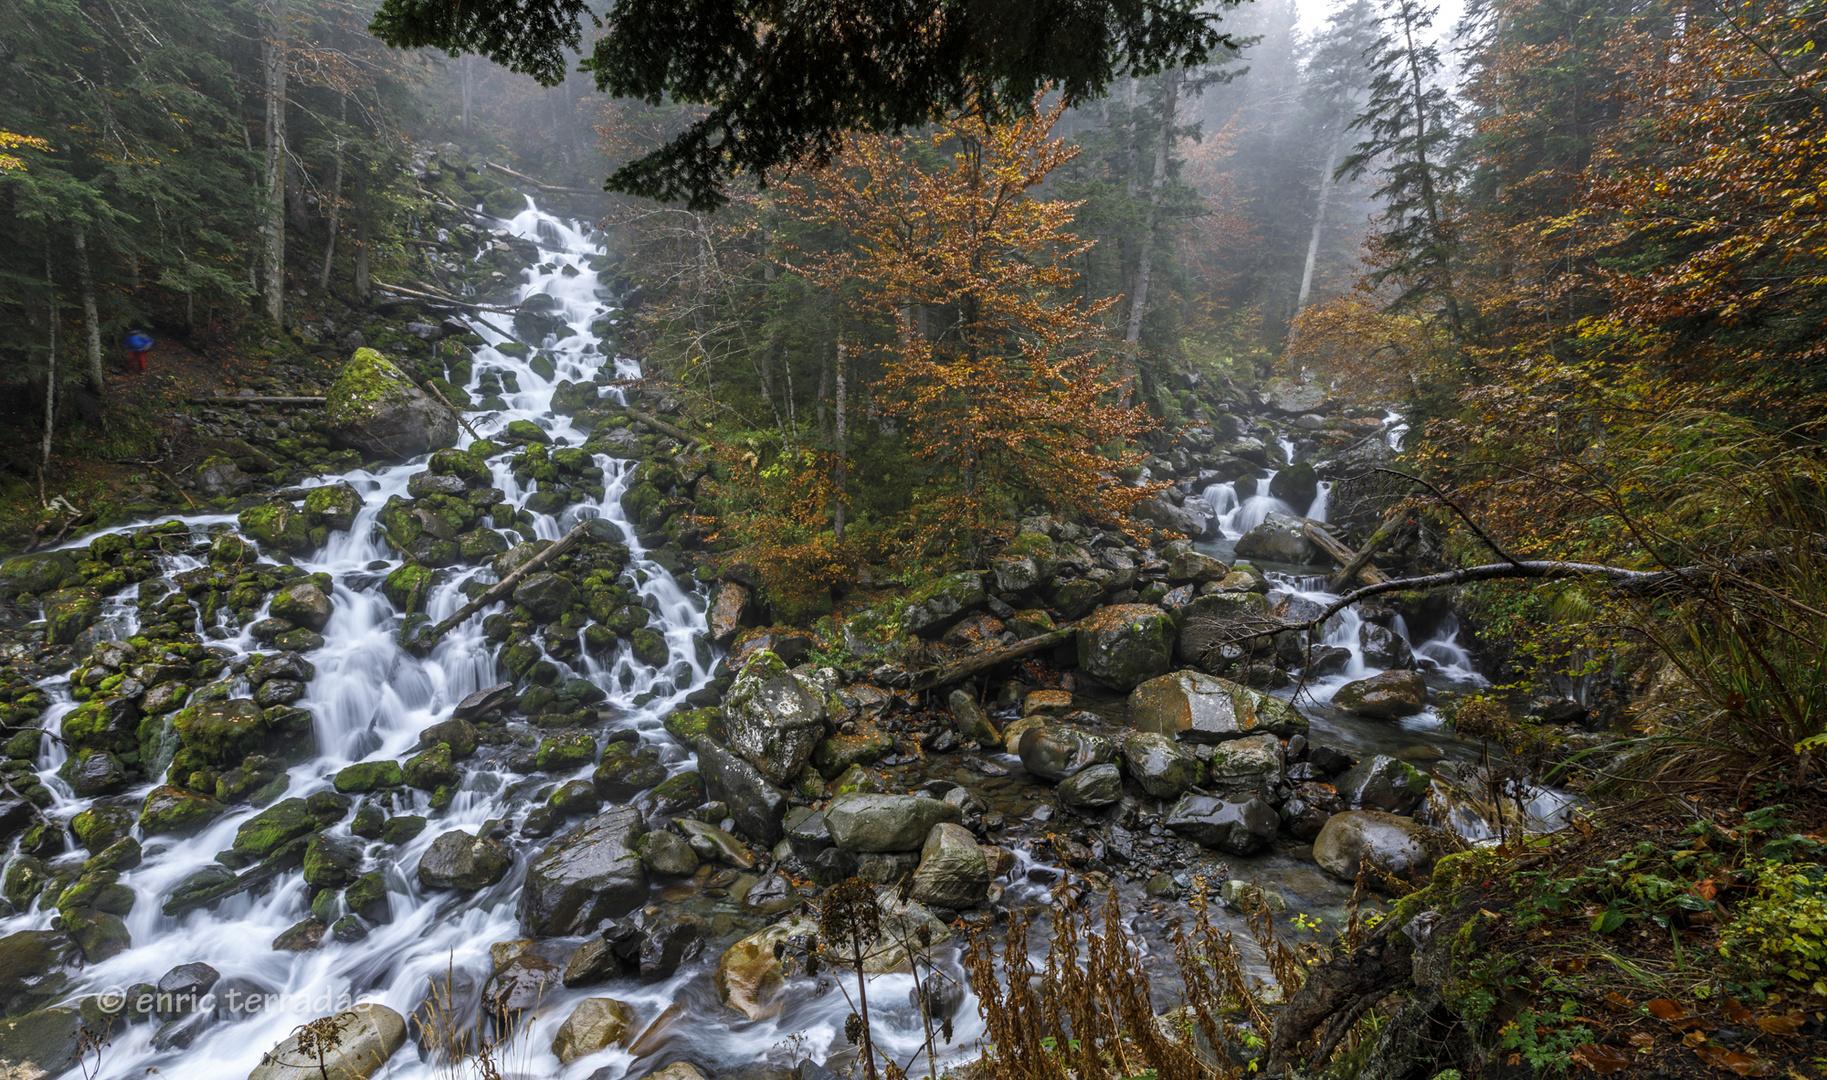 Uelhs deth Joèu - Val d'Aran